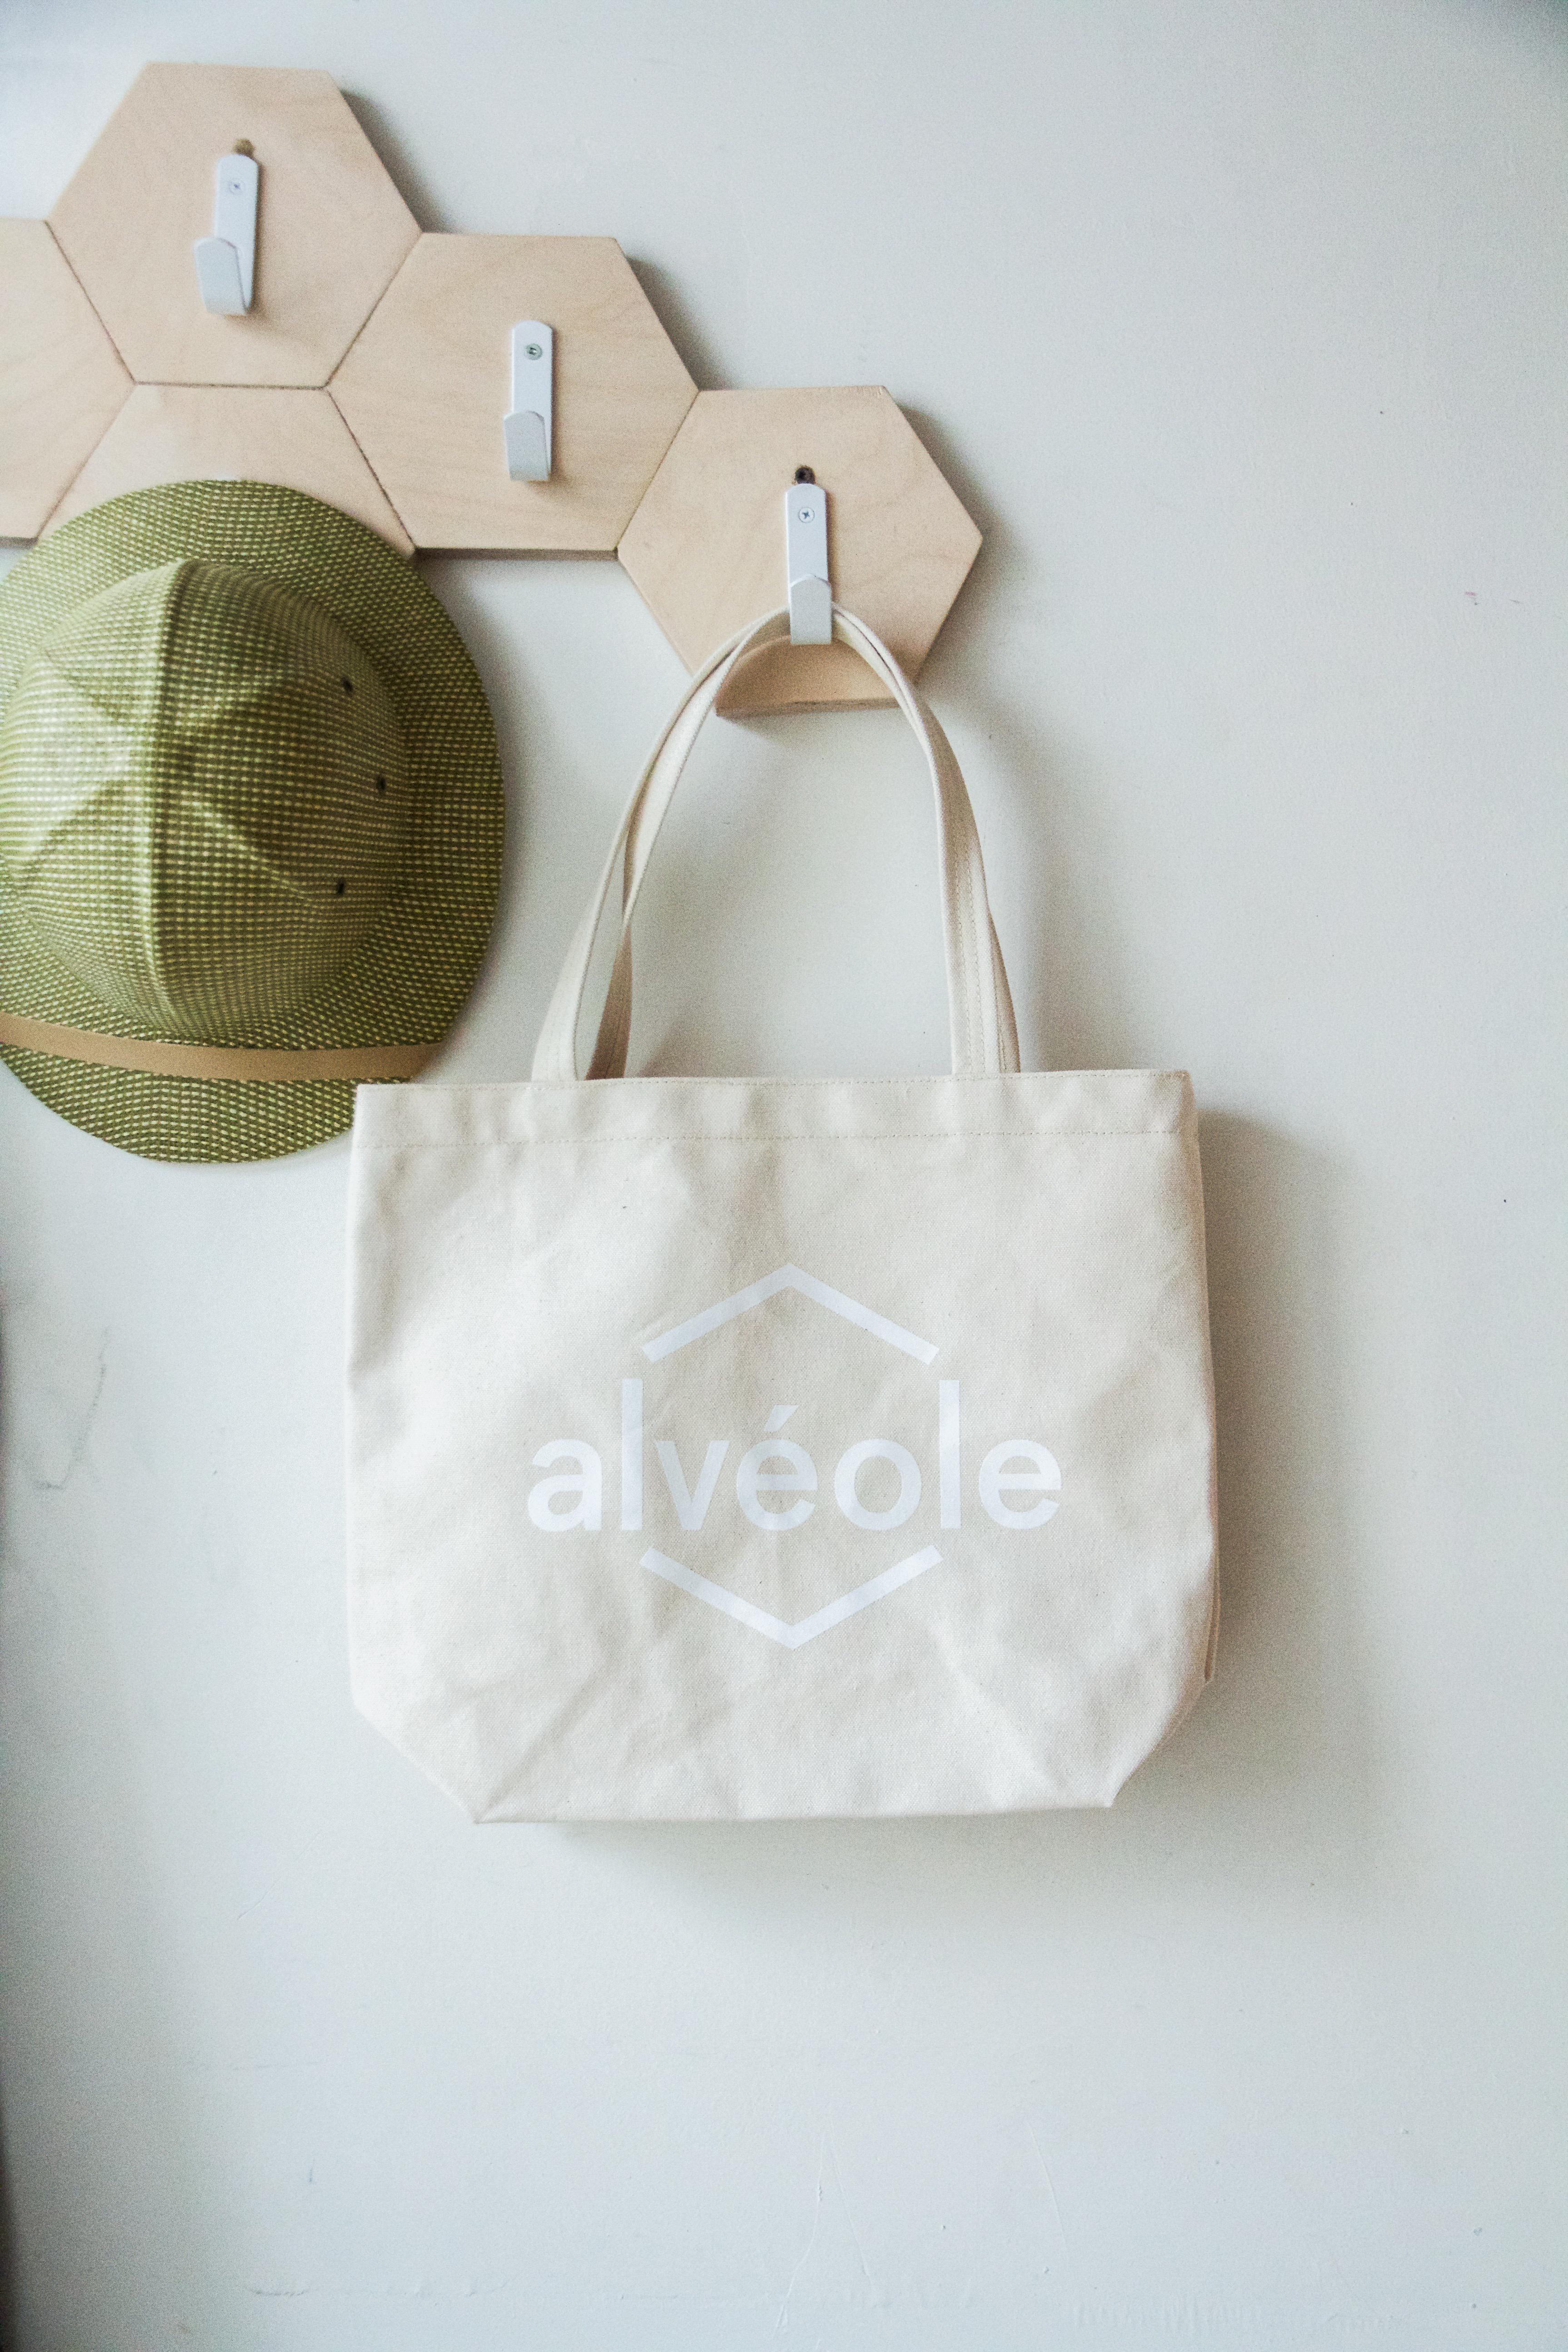 Alveole-12